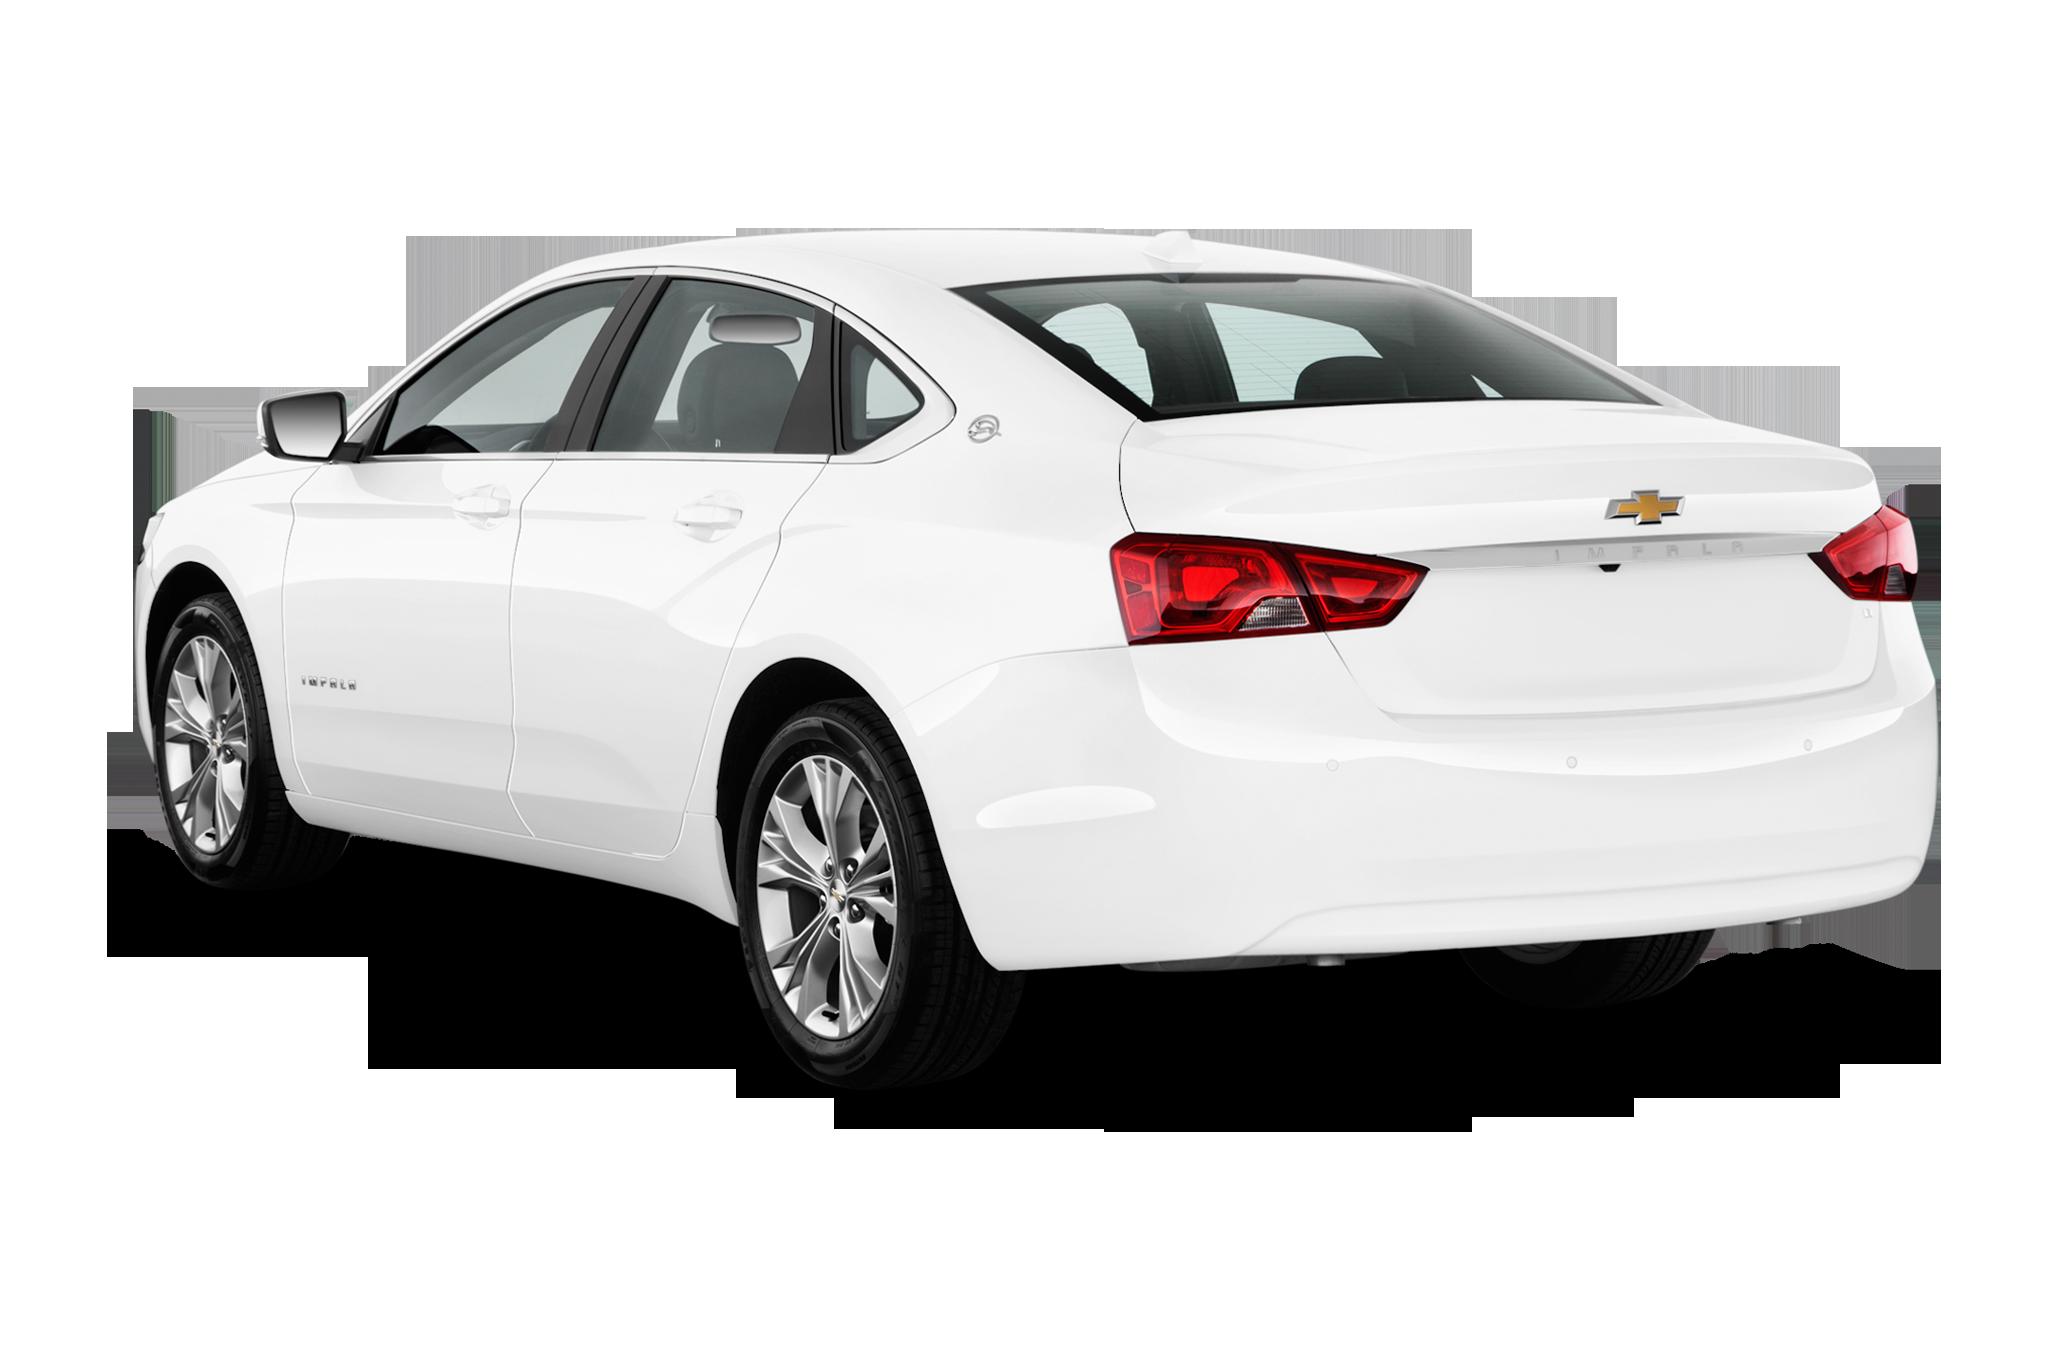 Chevrolet Impala PNG Image